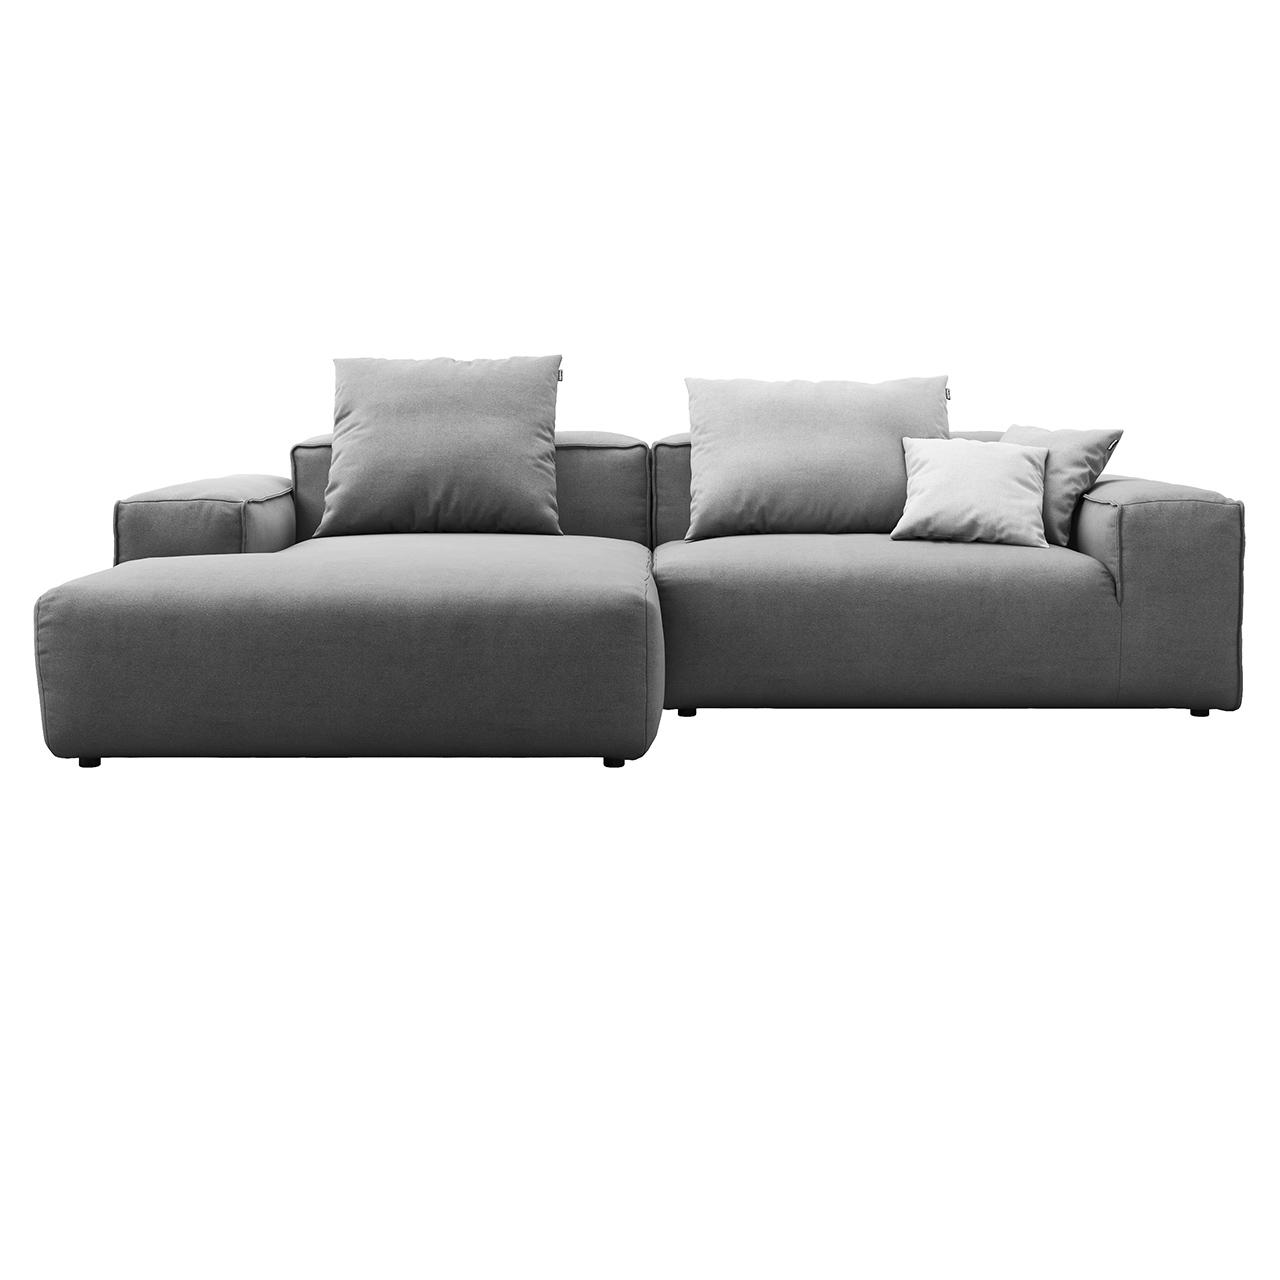 Freistil 175 Sofa by Rolf Benz Dimensiva